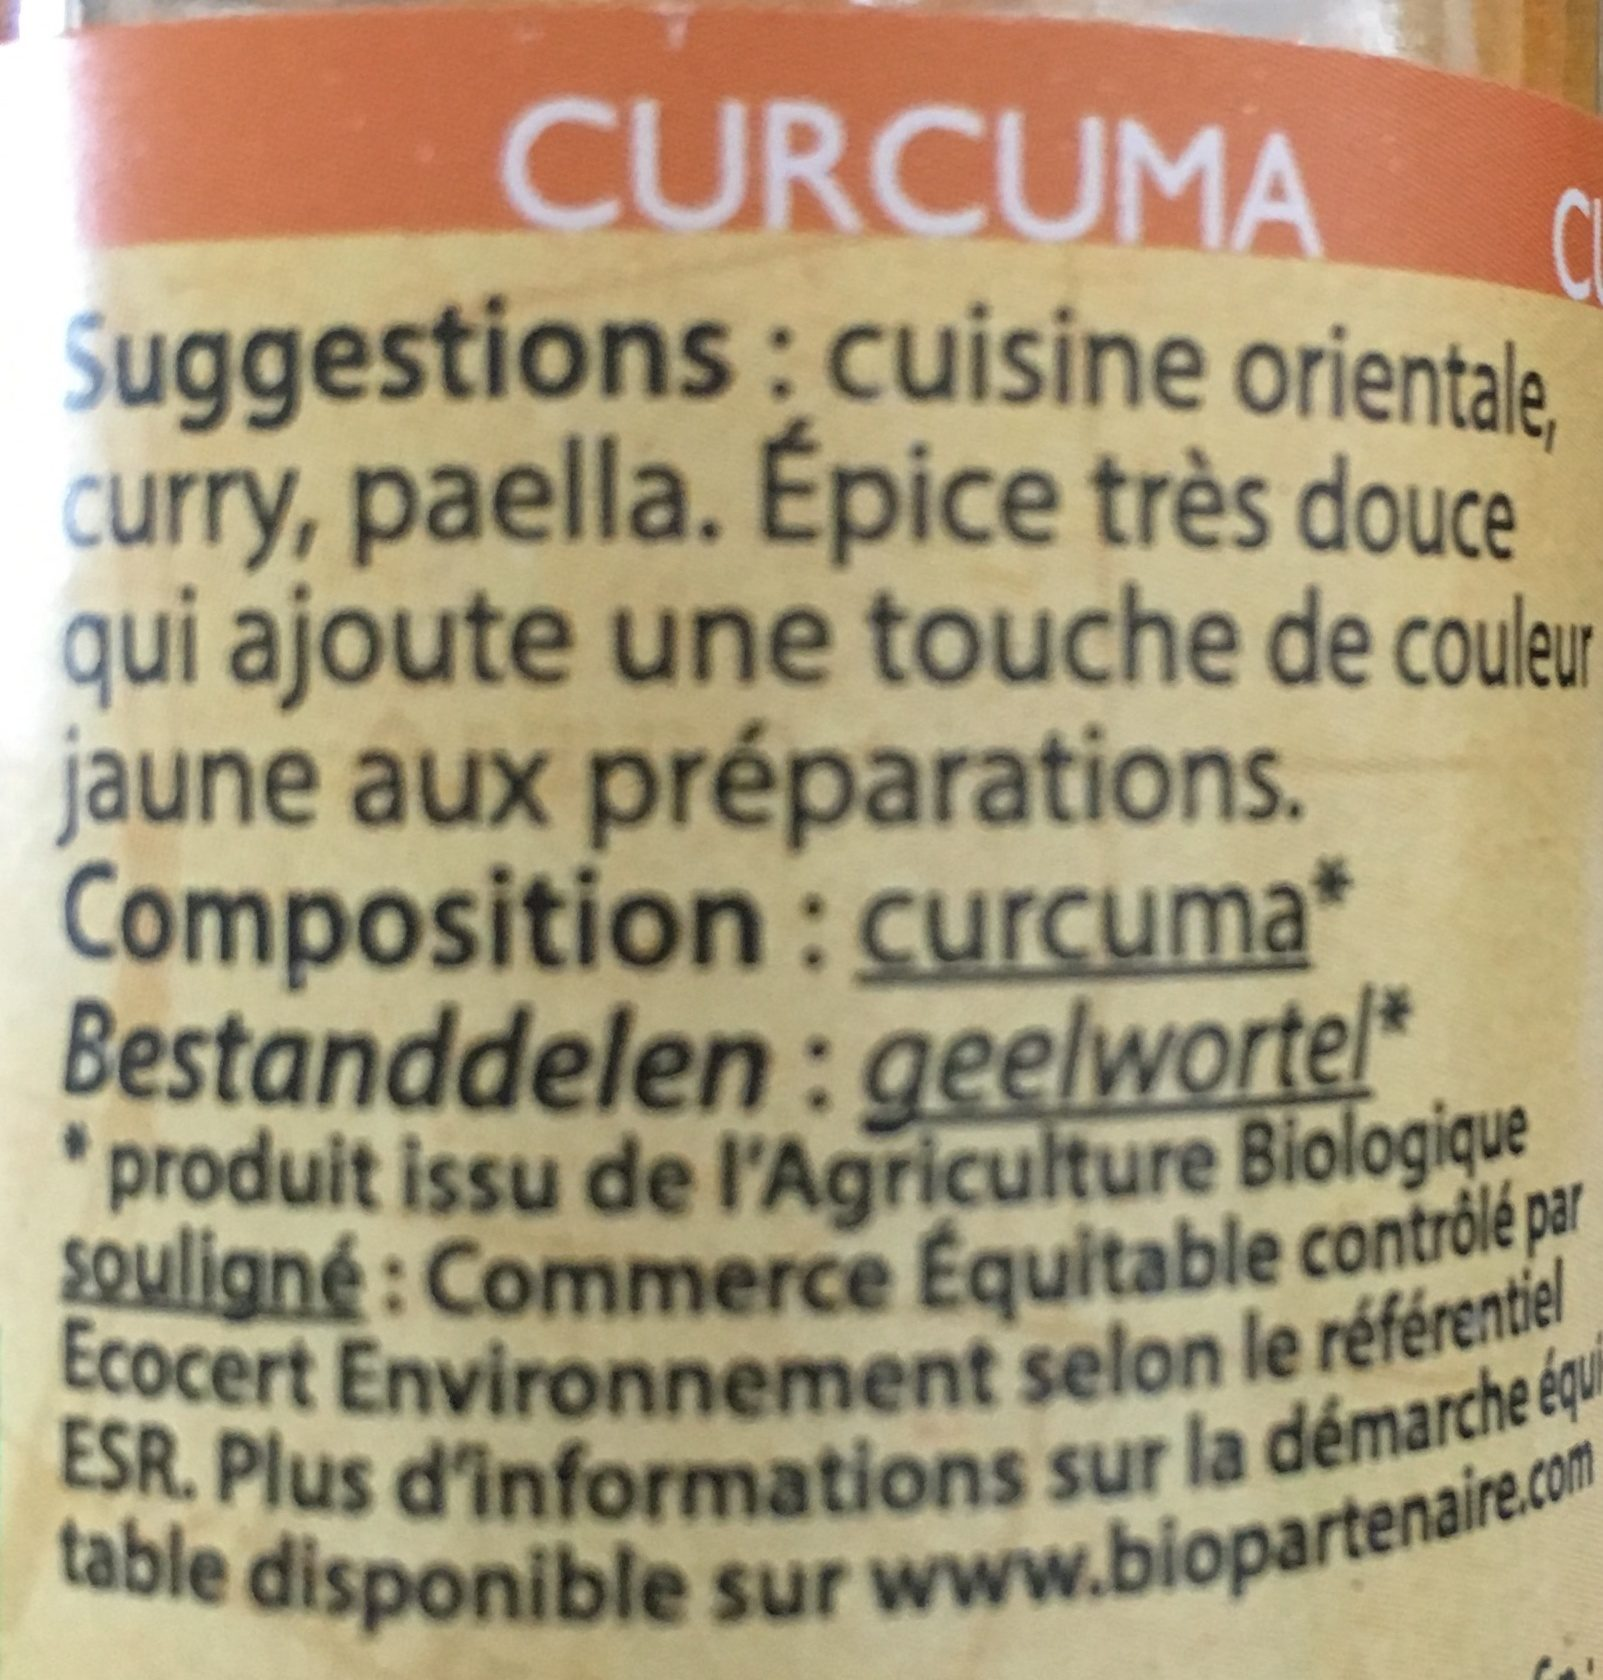 Curcuma poudre - Ingrediënten - fr